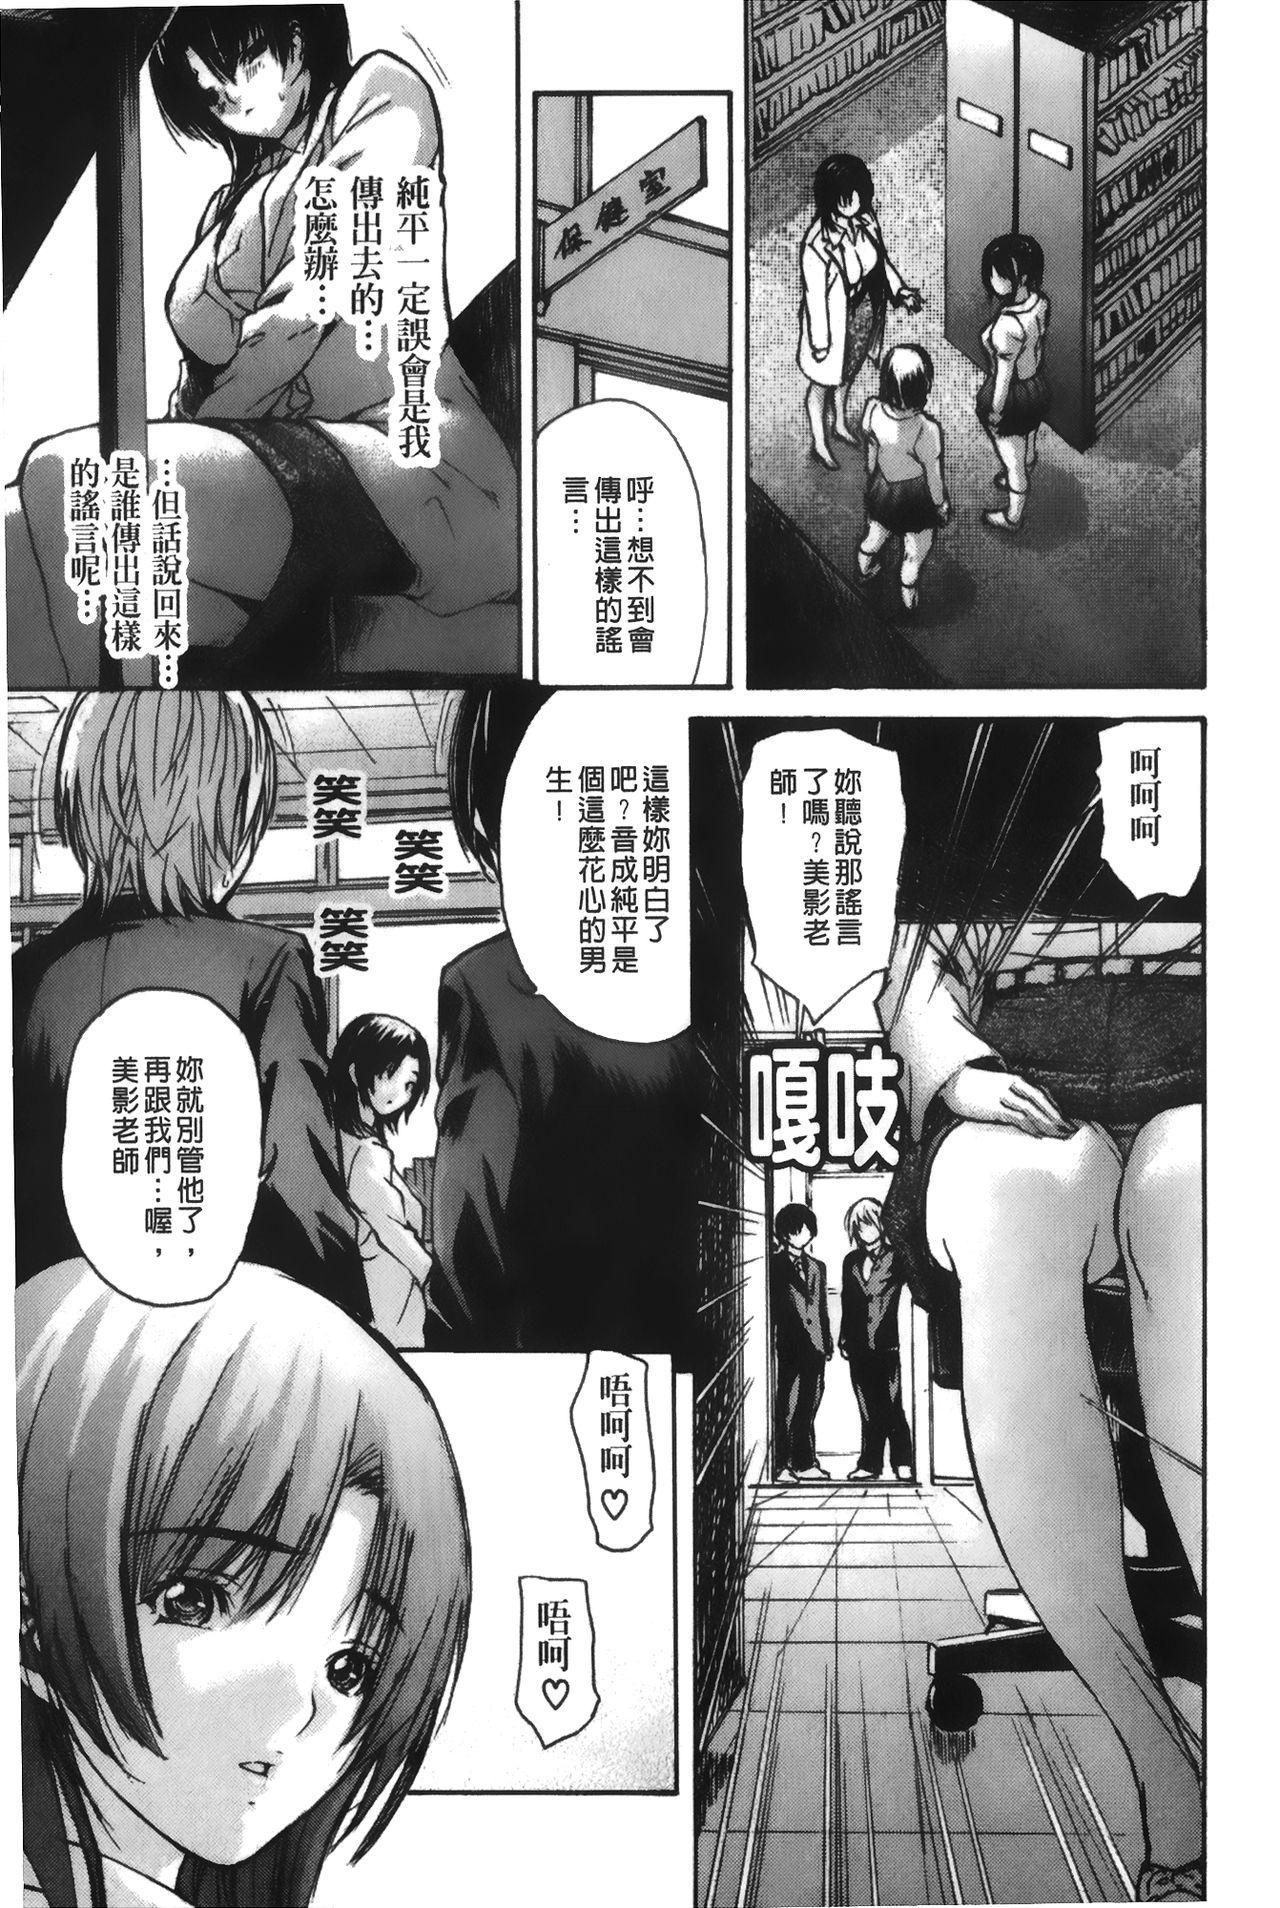 Tonari no Minano Sensei 4 | 隔壁的美奈乃老師 4 138